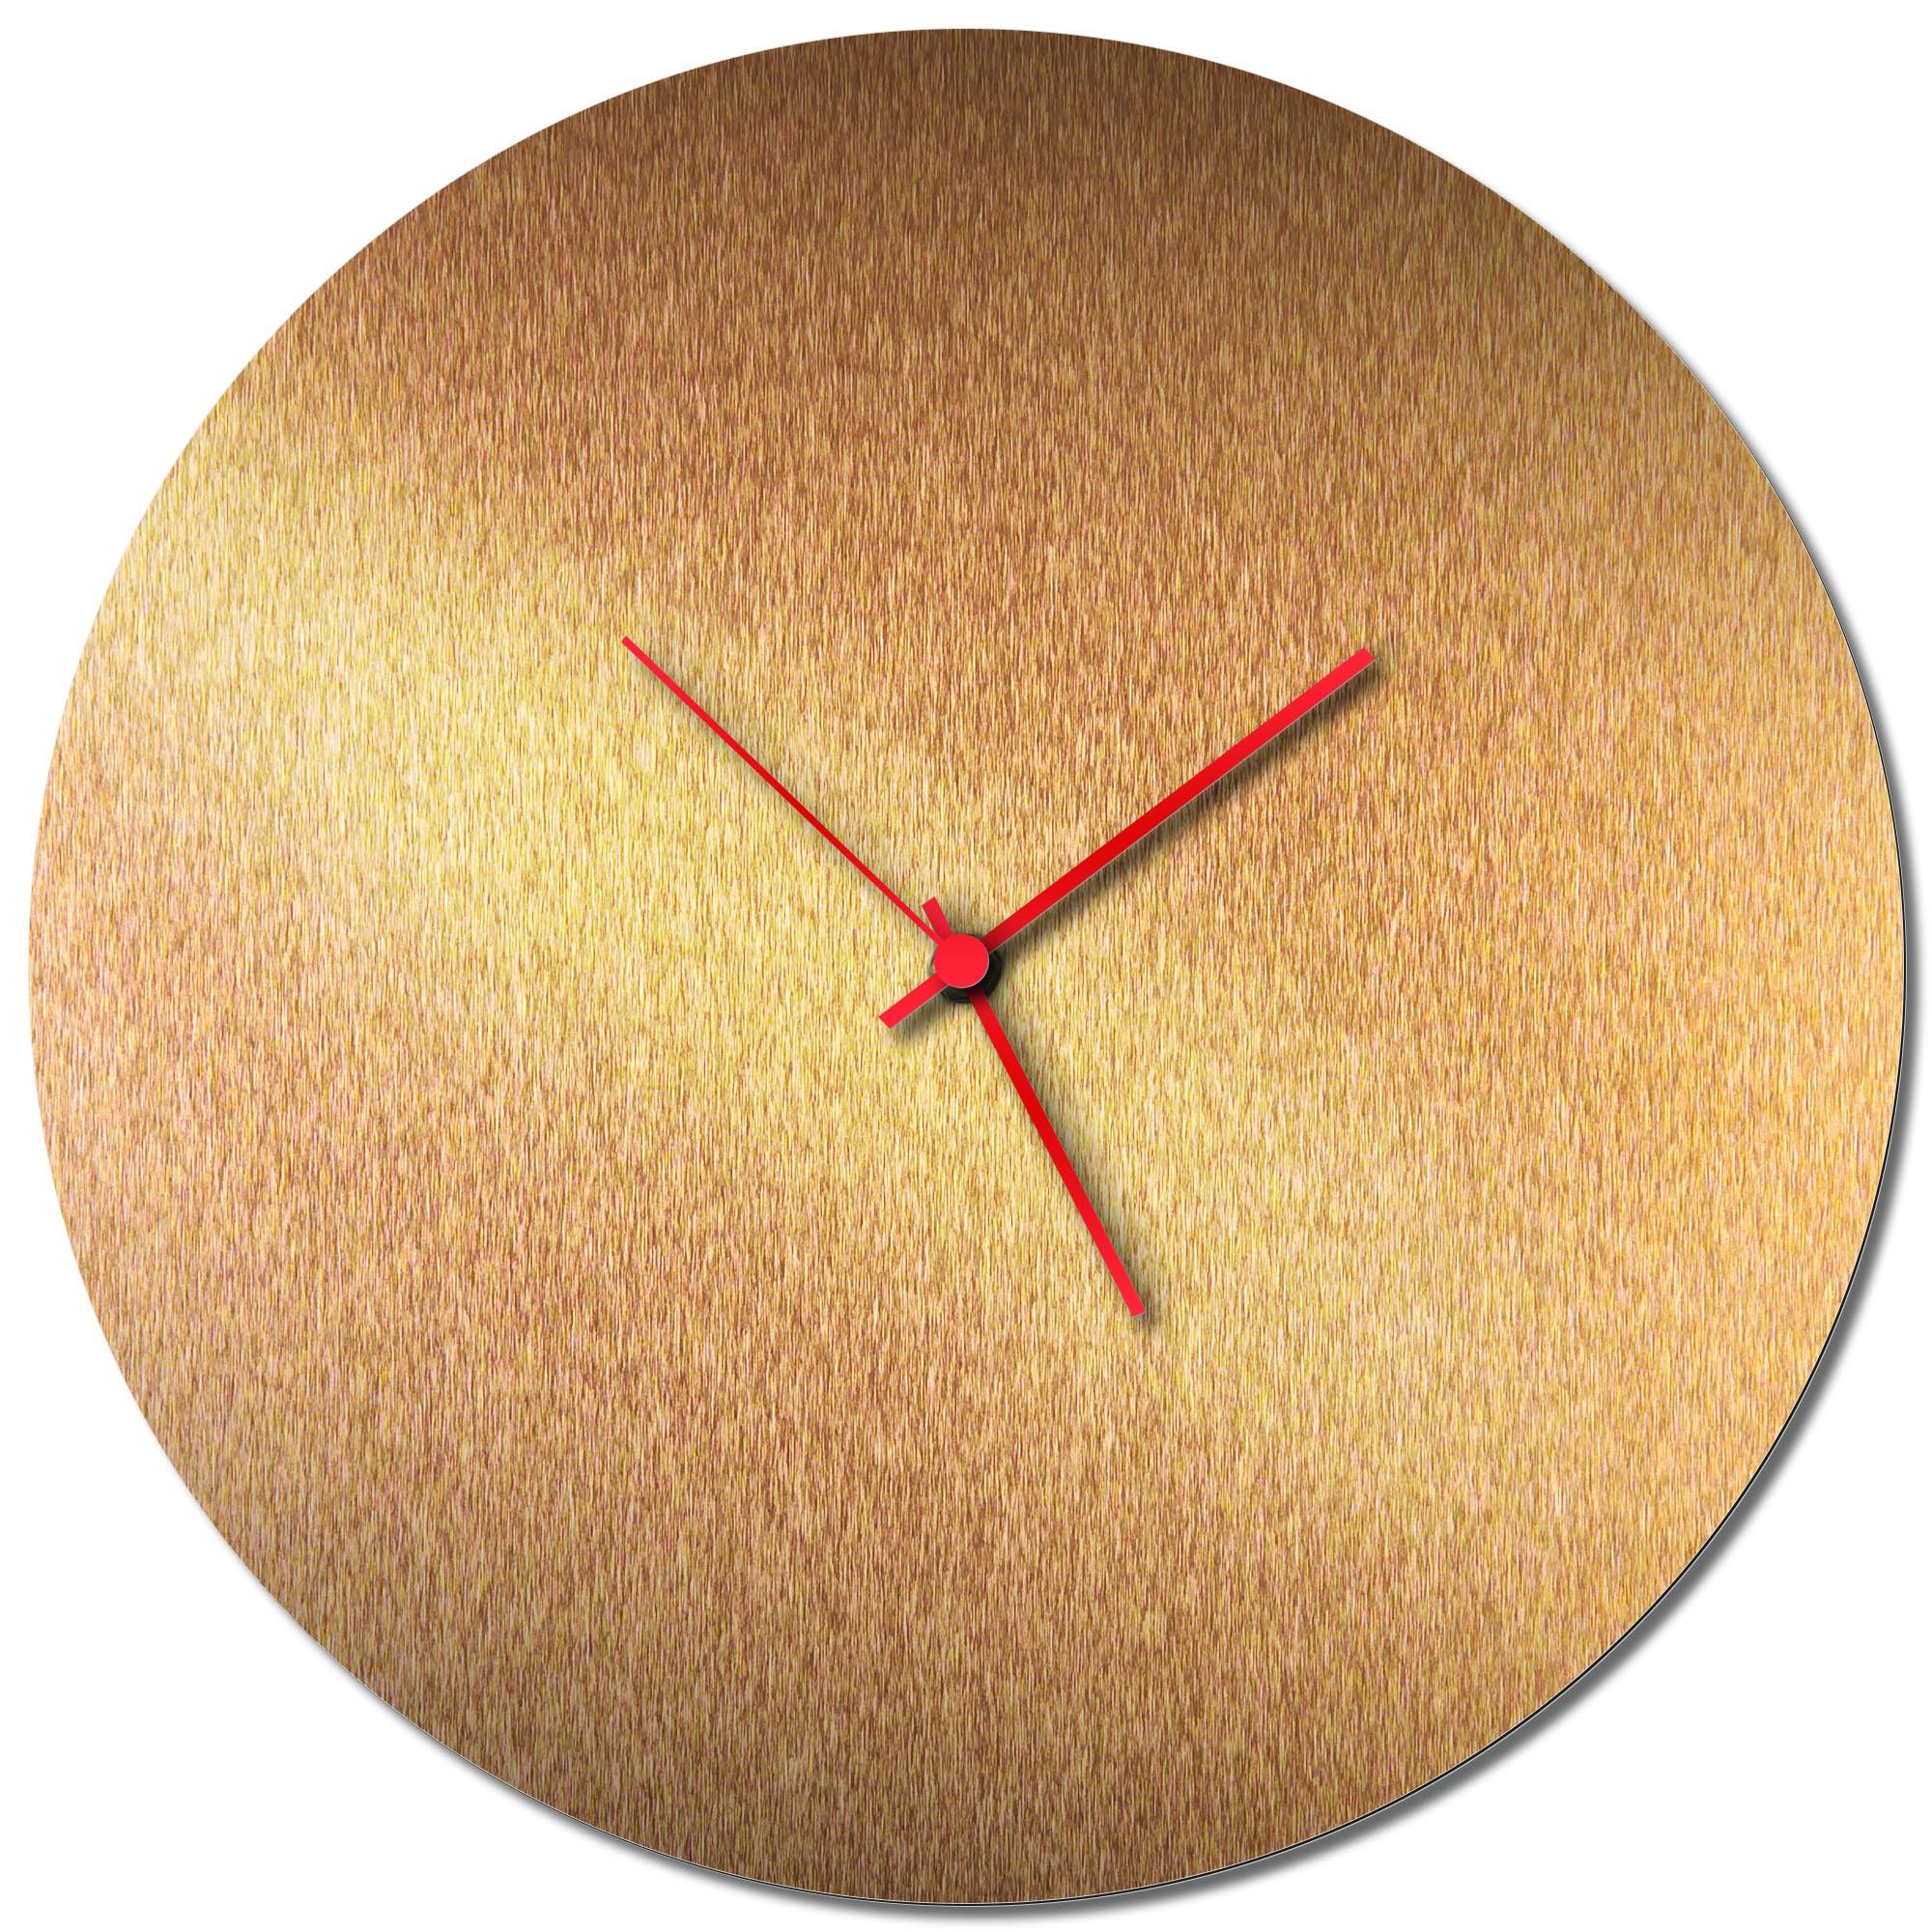 Adam Schwoeppe 'Bronzesmith Circle Clock Large Red' Midcentury Modern Style Wall Clock